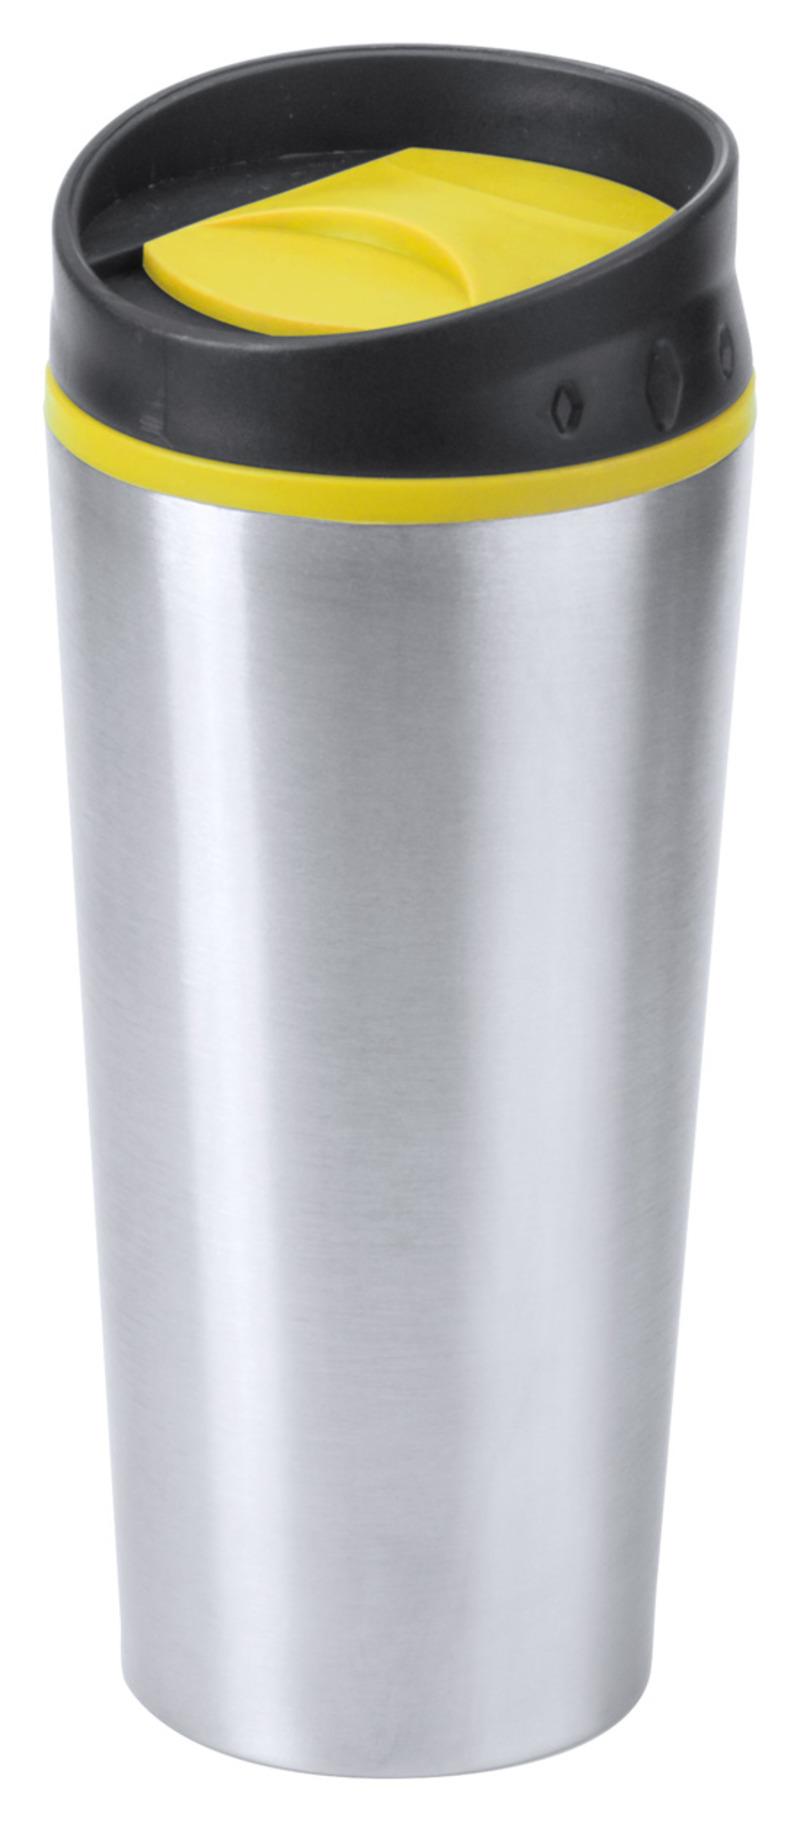 Nozem thermo mug